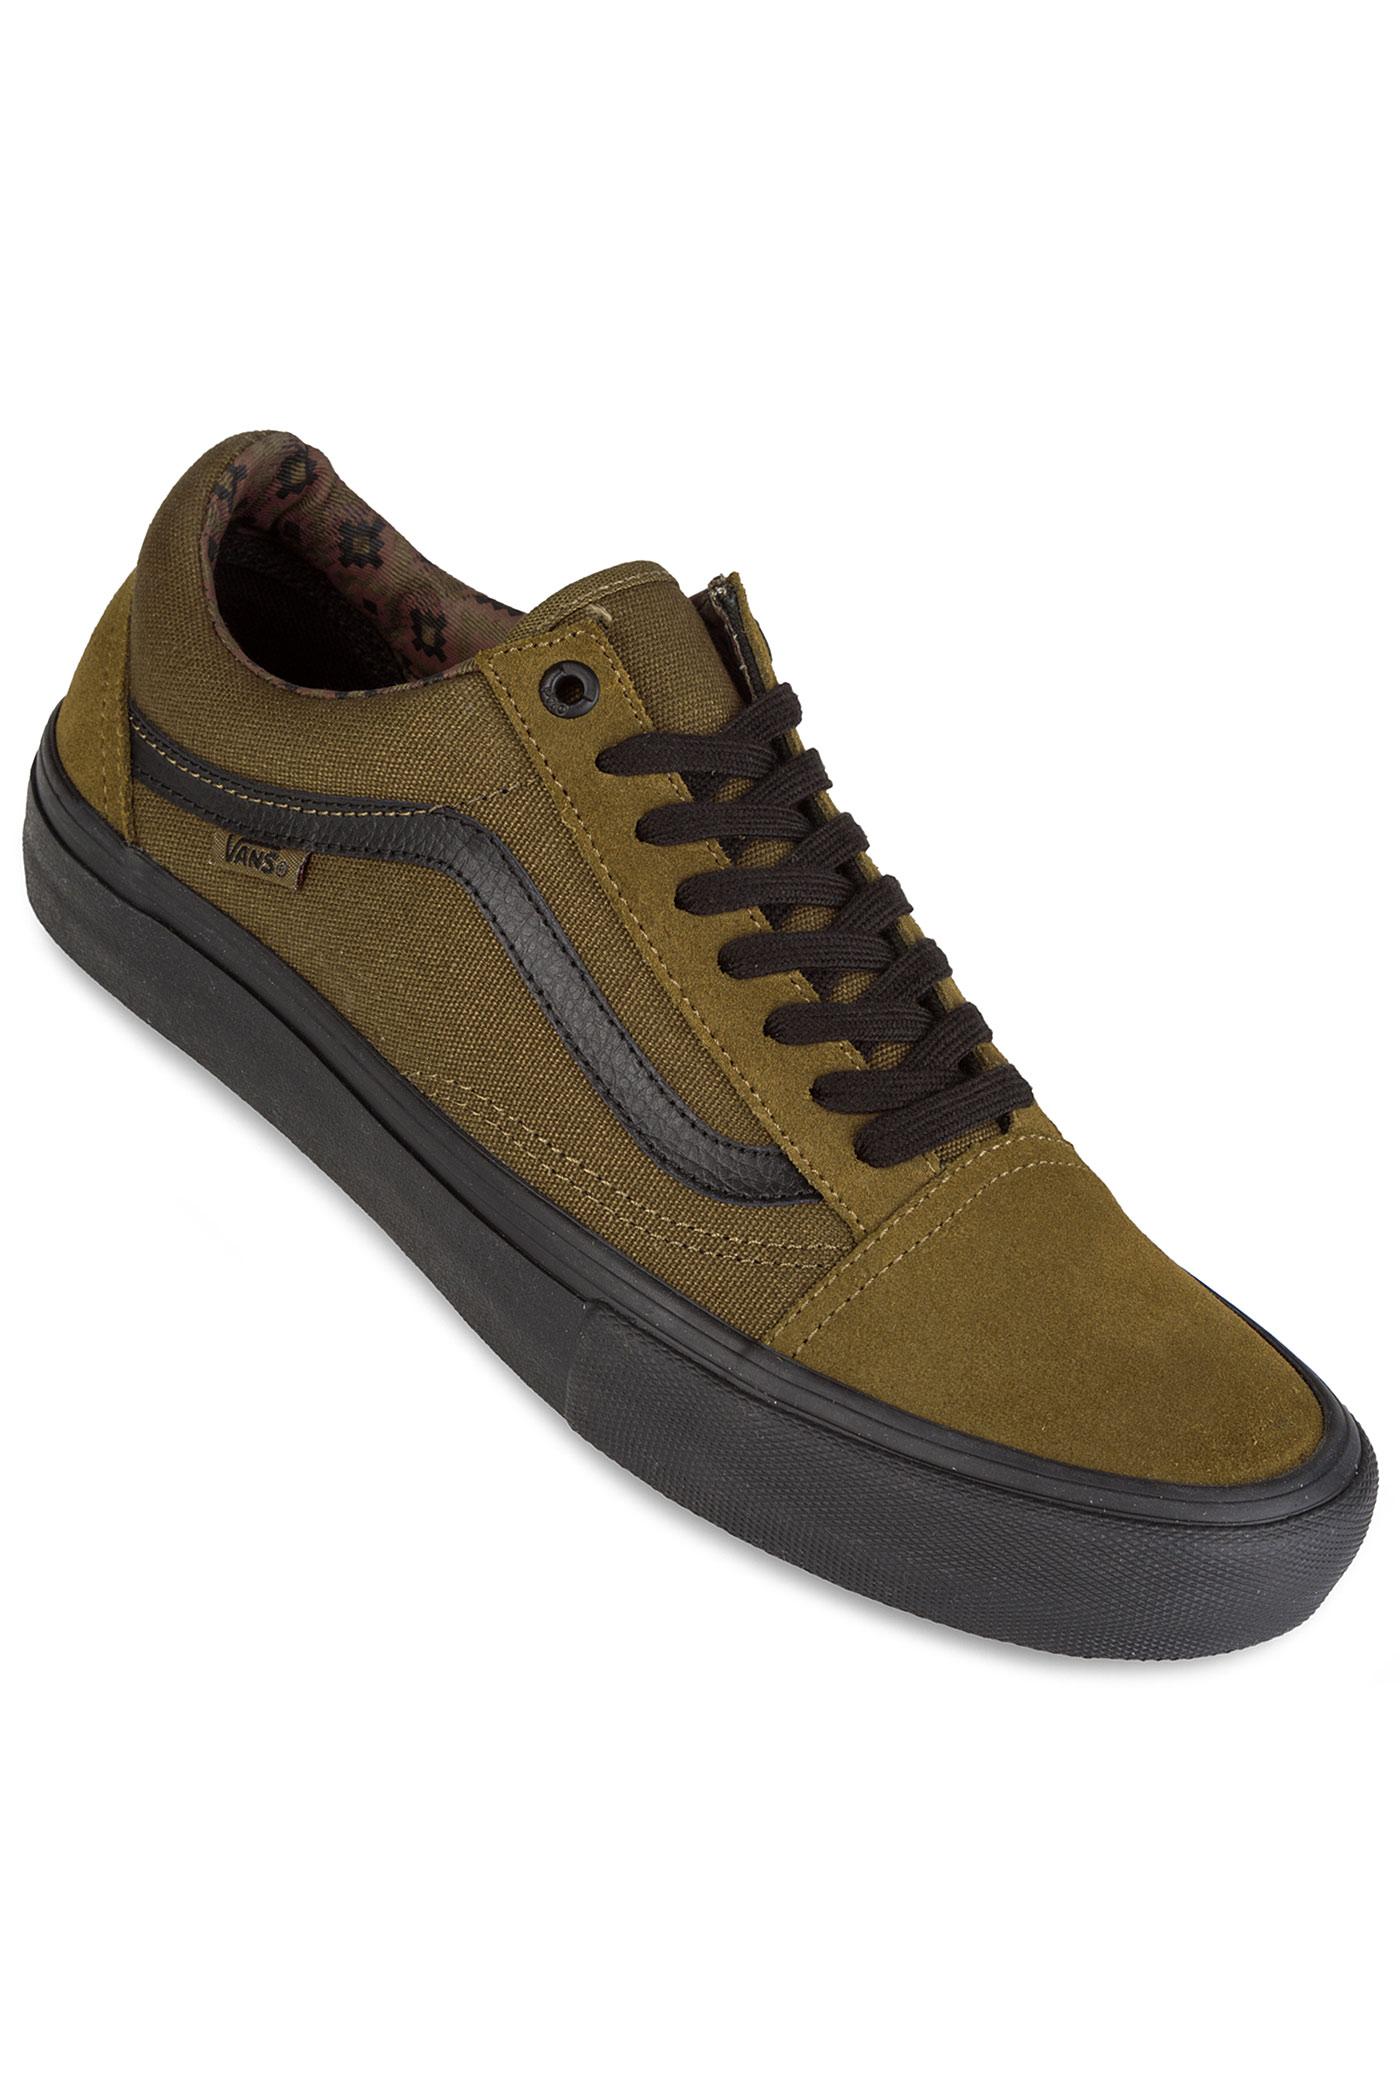 vans old skool pro chaussure teak black achetez sur skatedeluxe. Black Bedroom Furniture Sets. Home Design Ideas